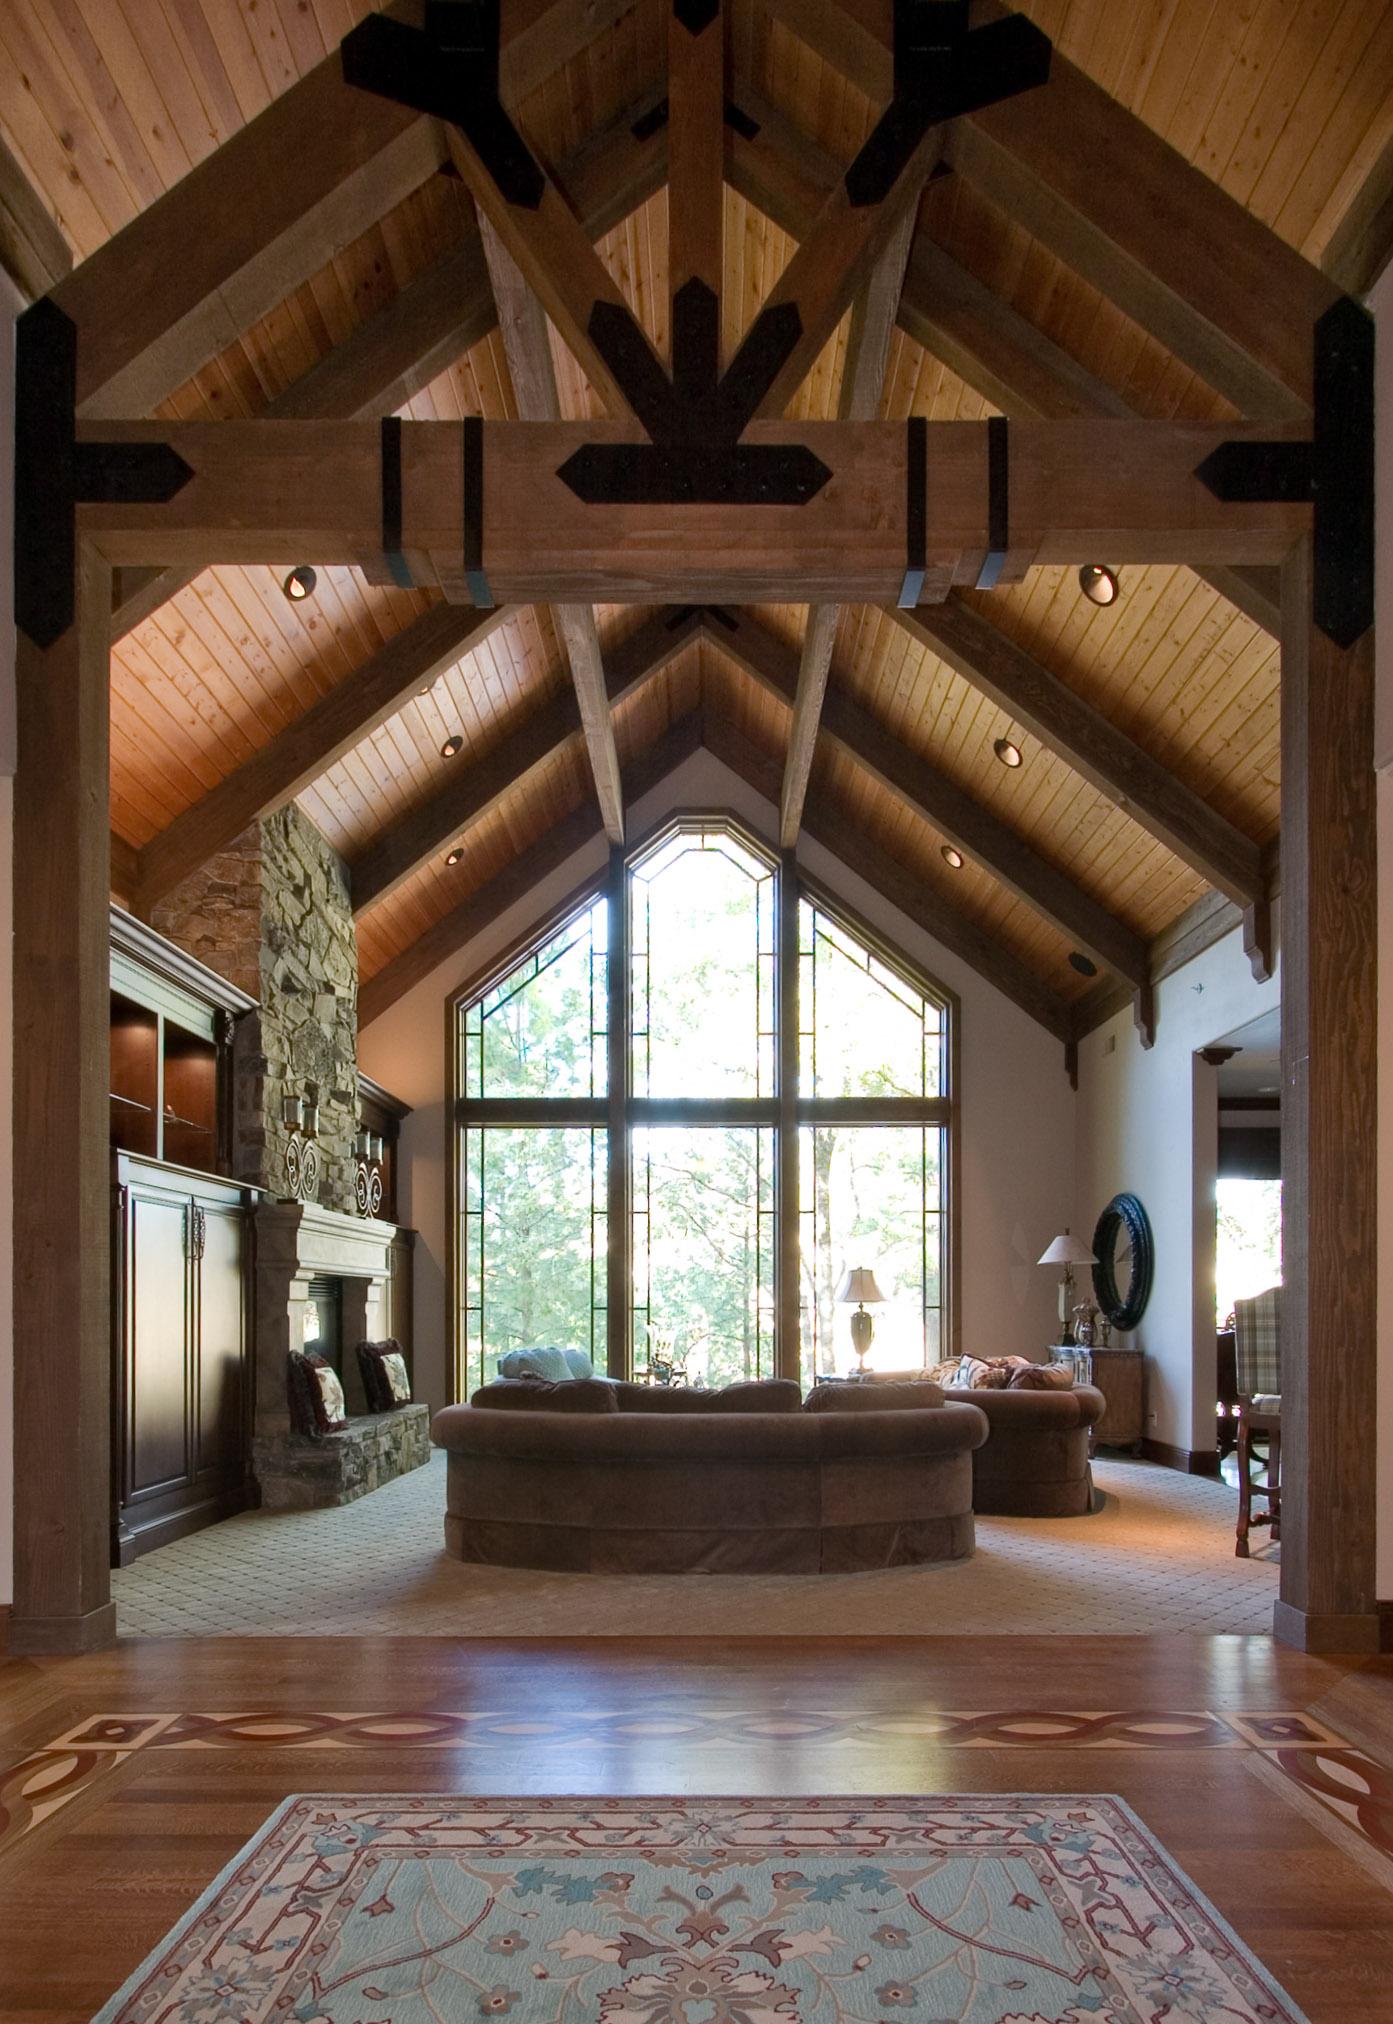 Northern California Rustic Home Builder-2.jpg